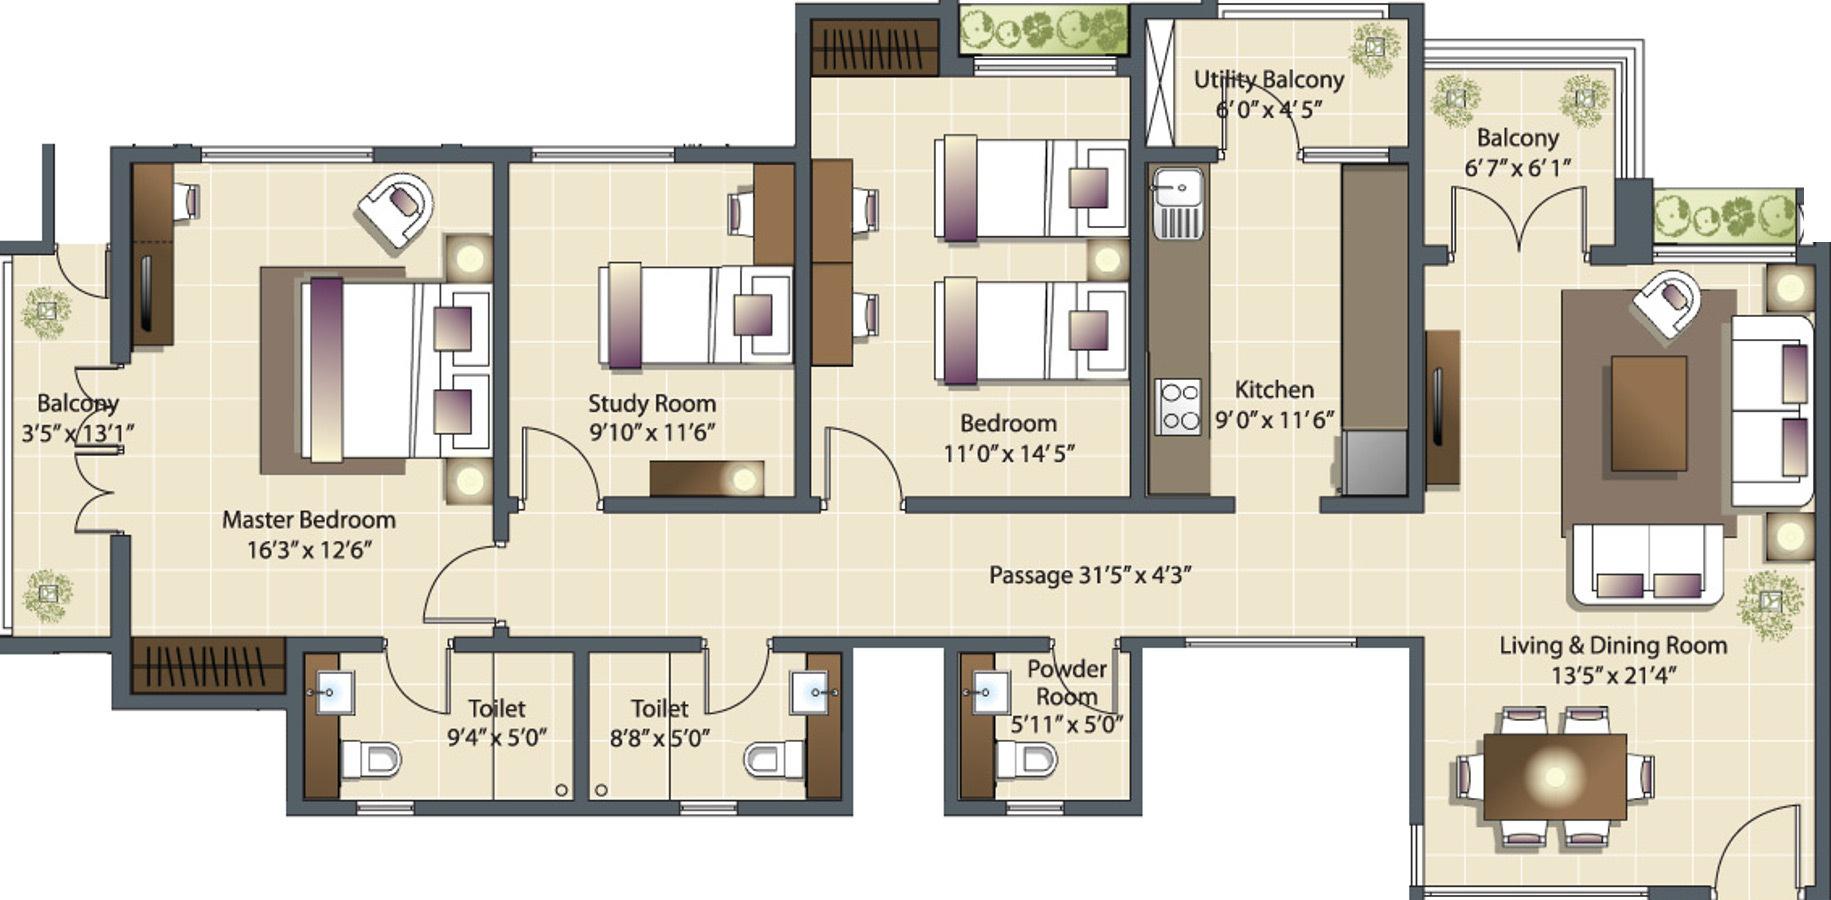 Luxora horizon apartments in manewada nagpur price for 12th floor apartments odessa